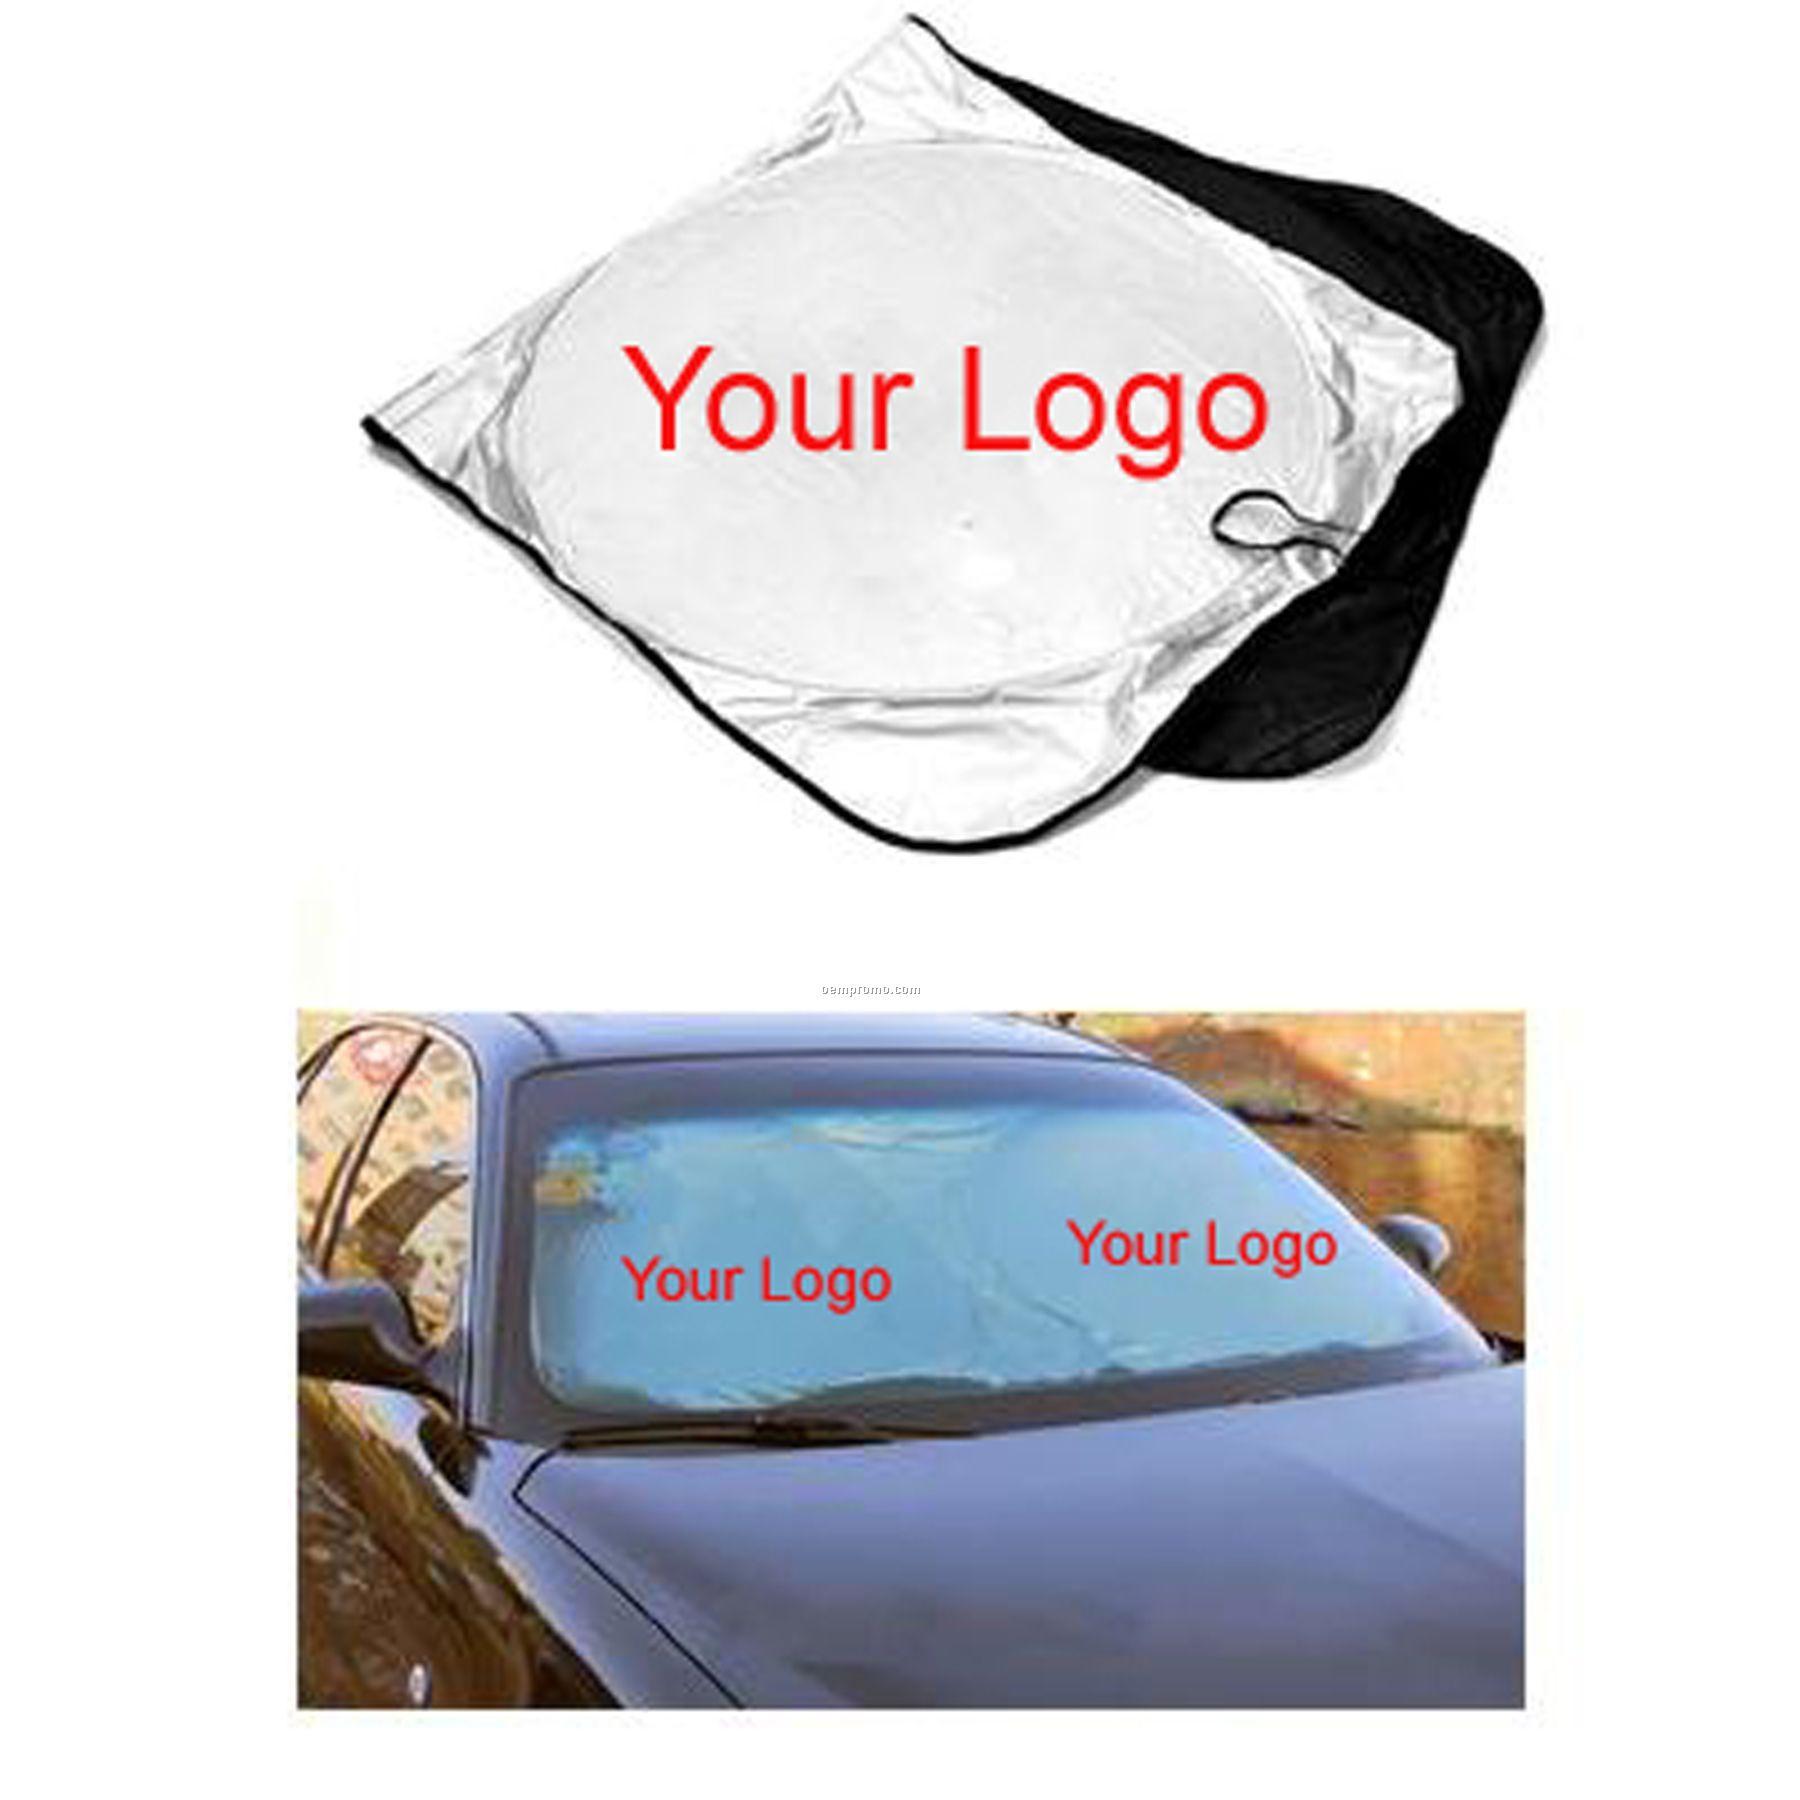 Car Front Window Sunshade/Sunscreen Block/Heatshield